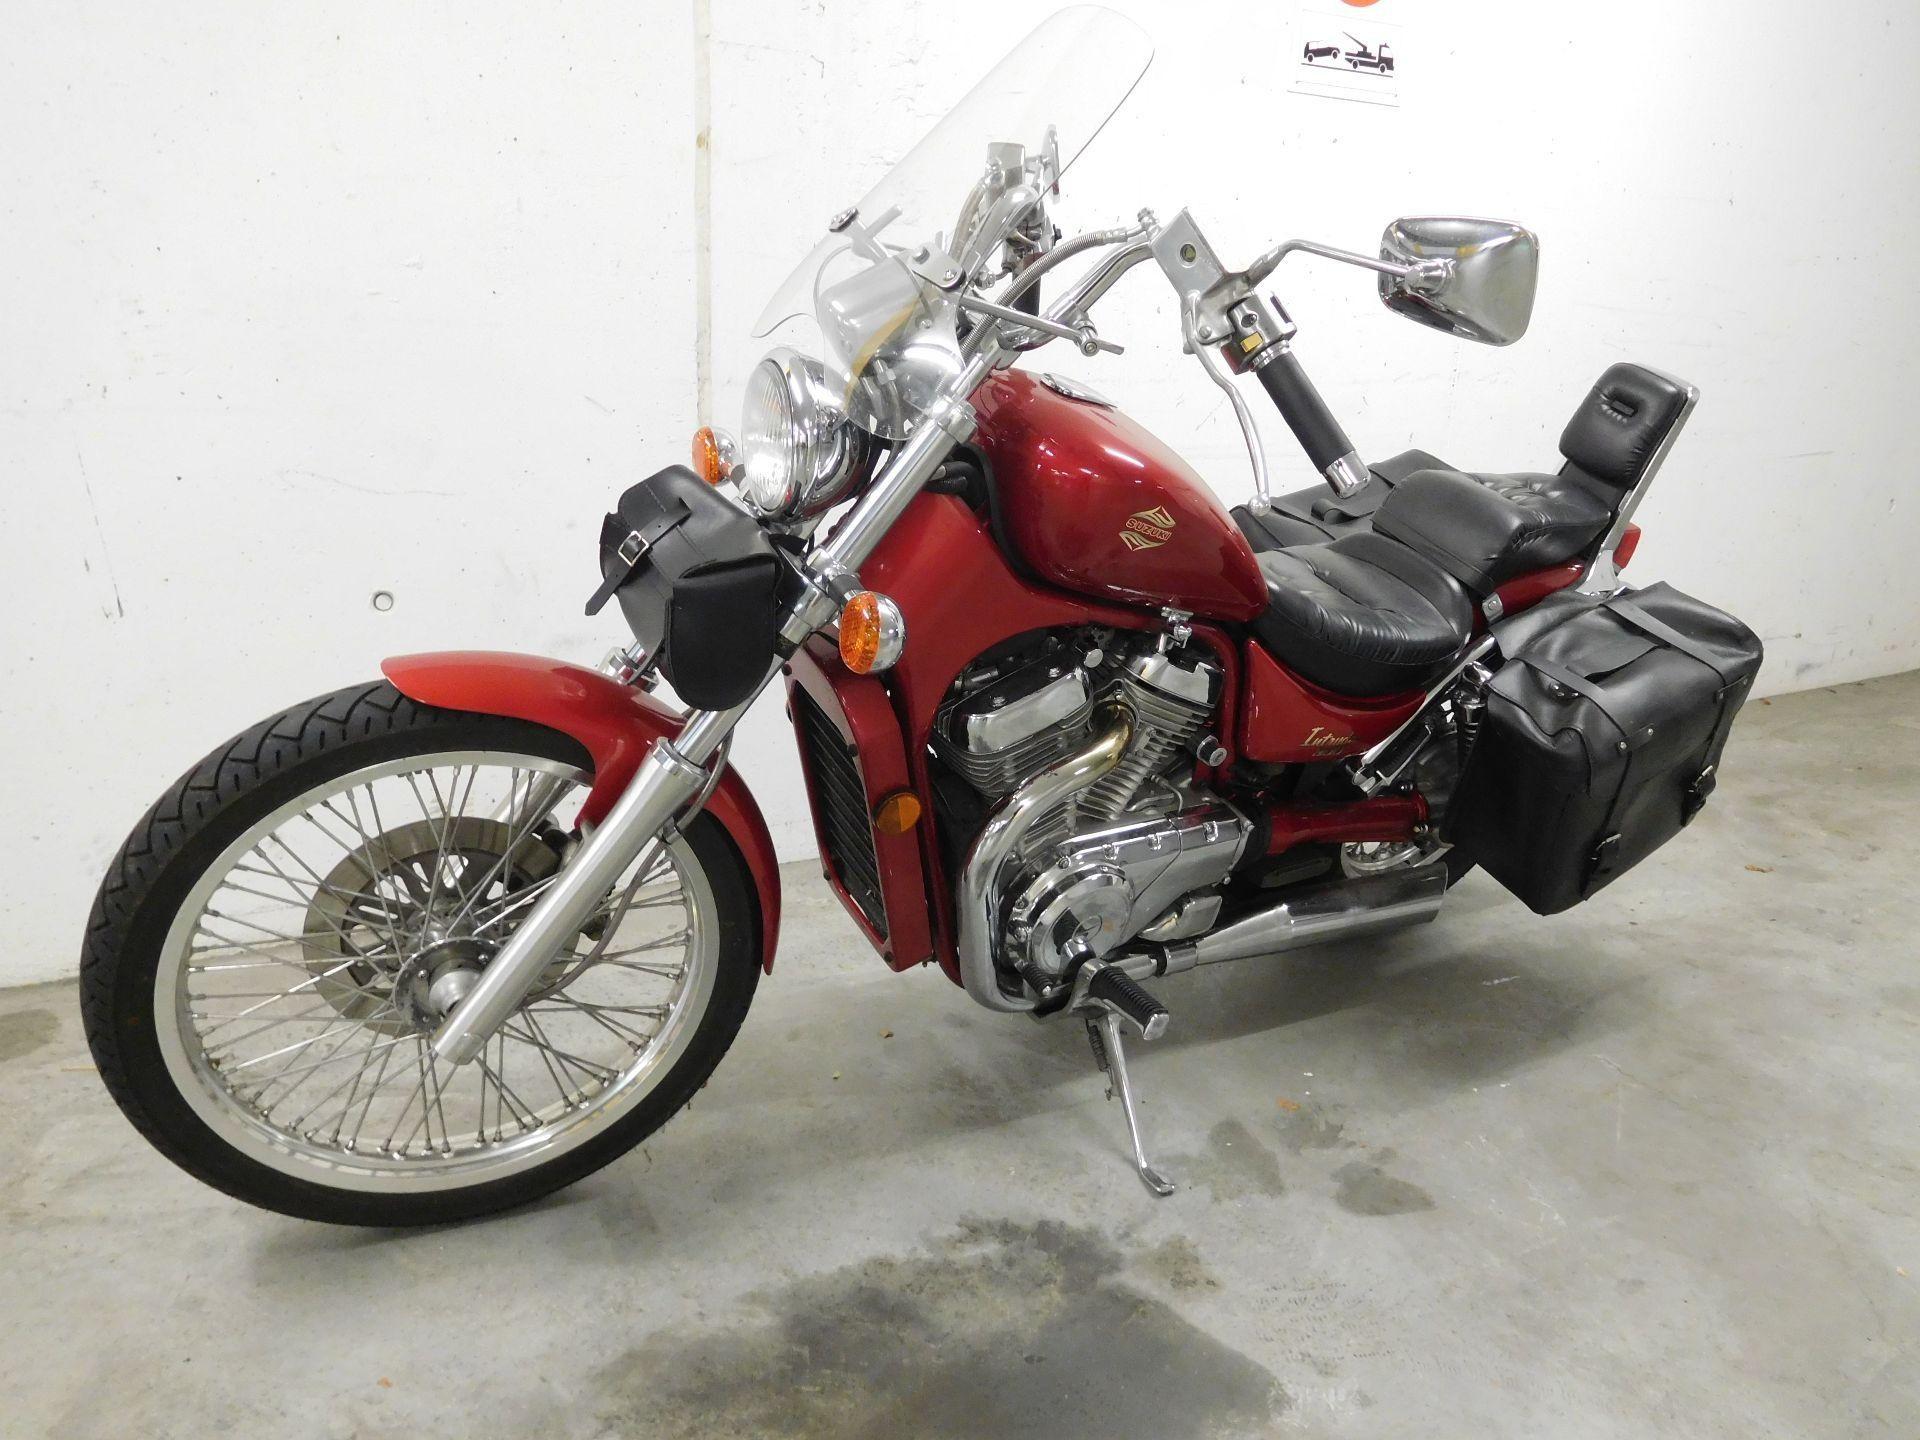 moto occasions acheter suzuki vs 800 gl intruder tmotorcycles gmbh z rich. Black Bedroom Furniture Sets. Home Design Ideas